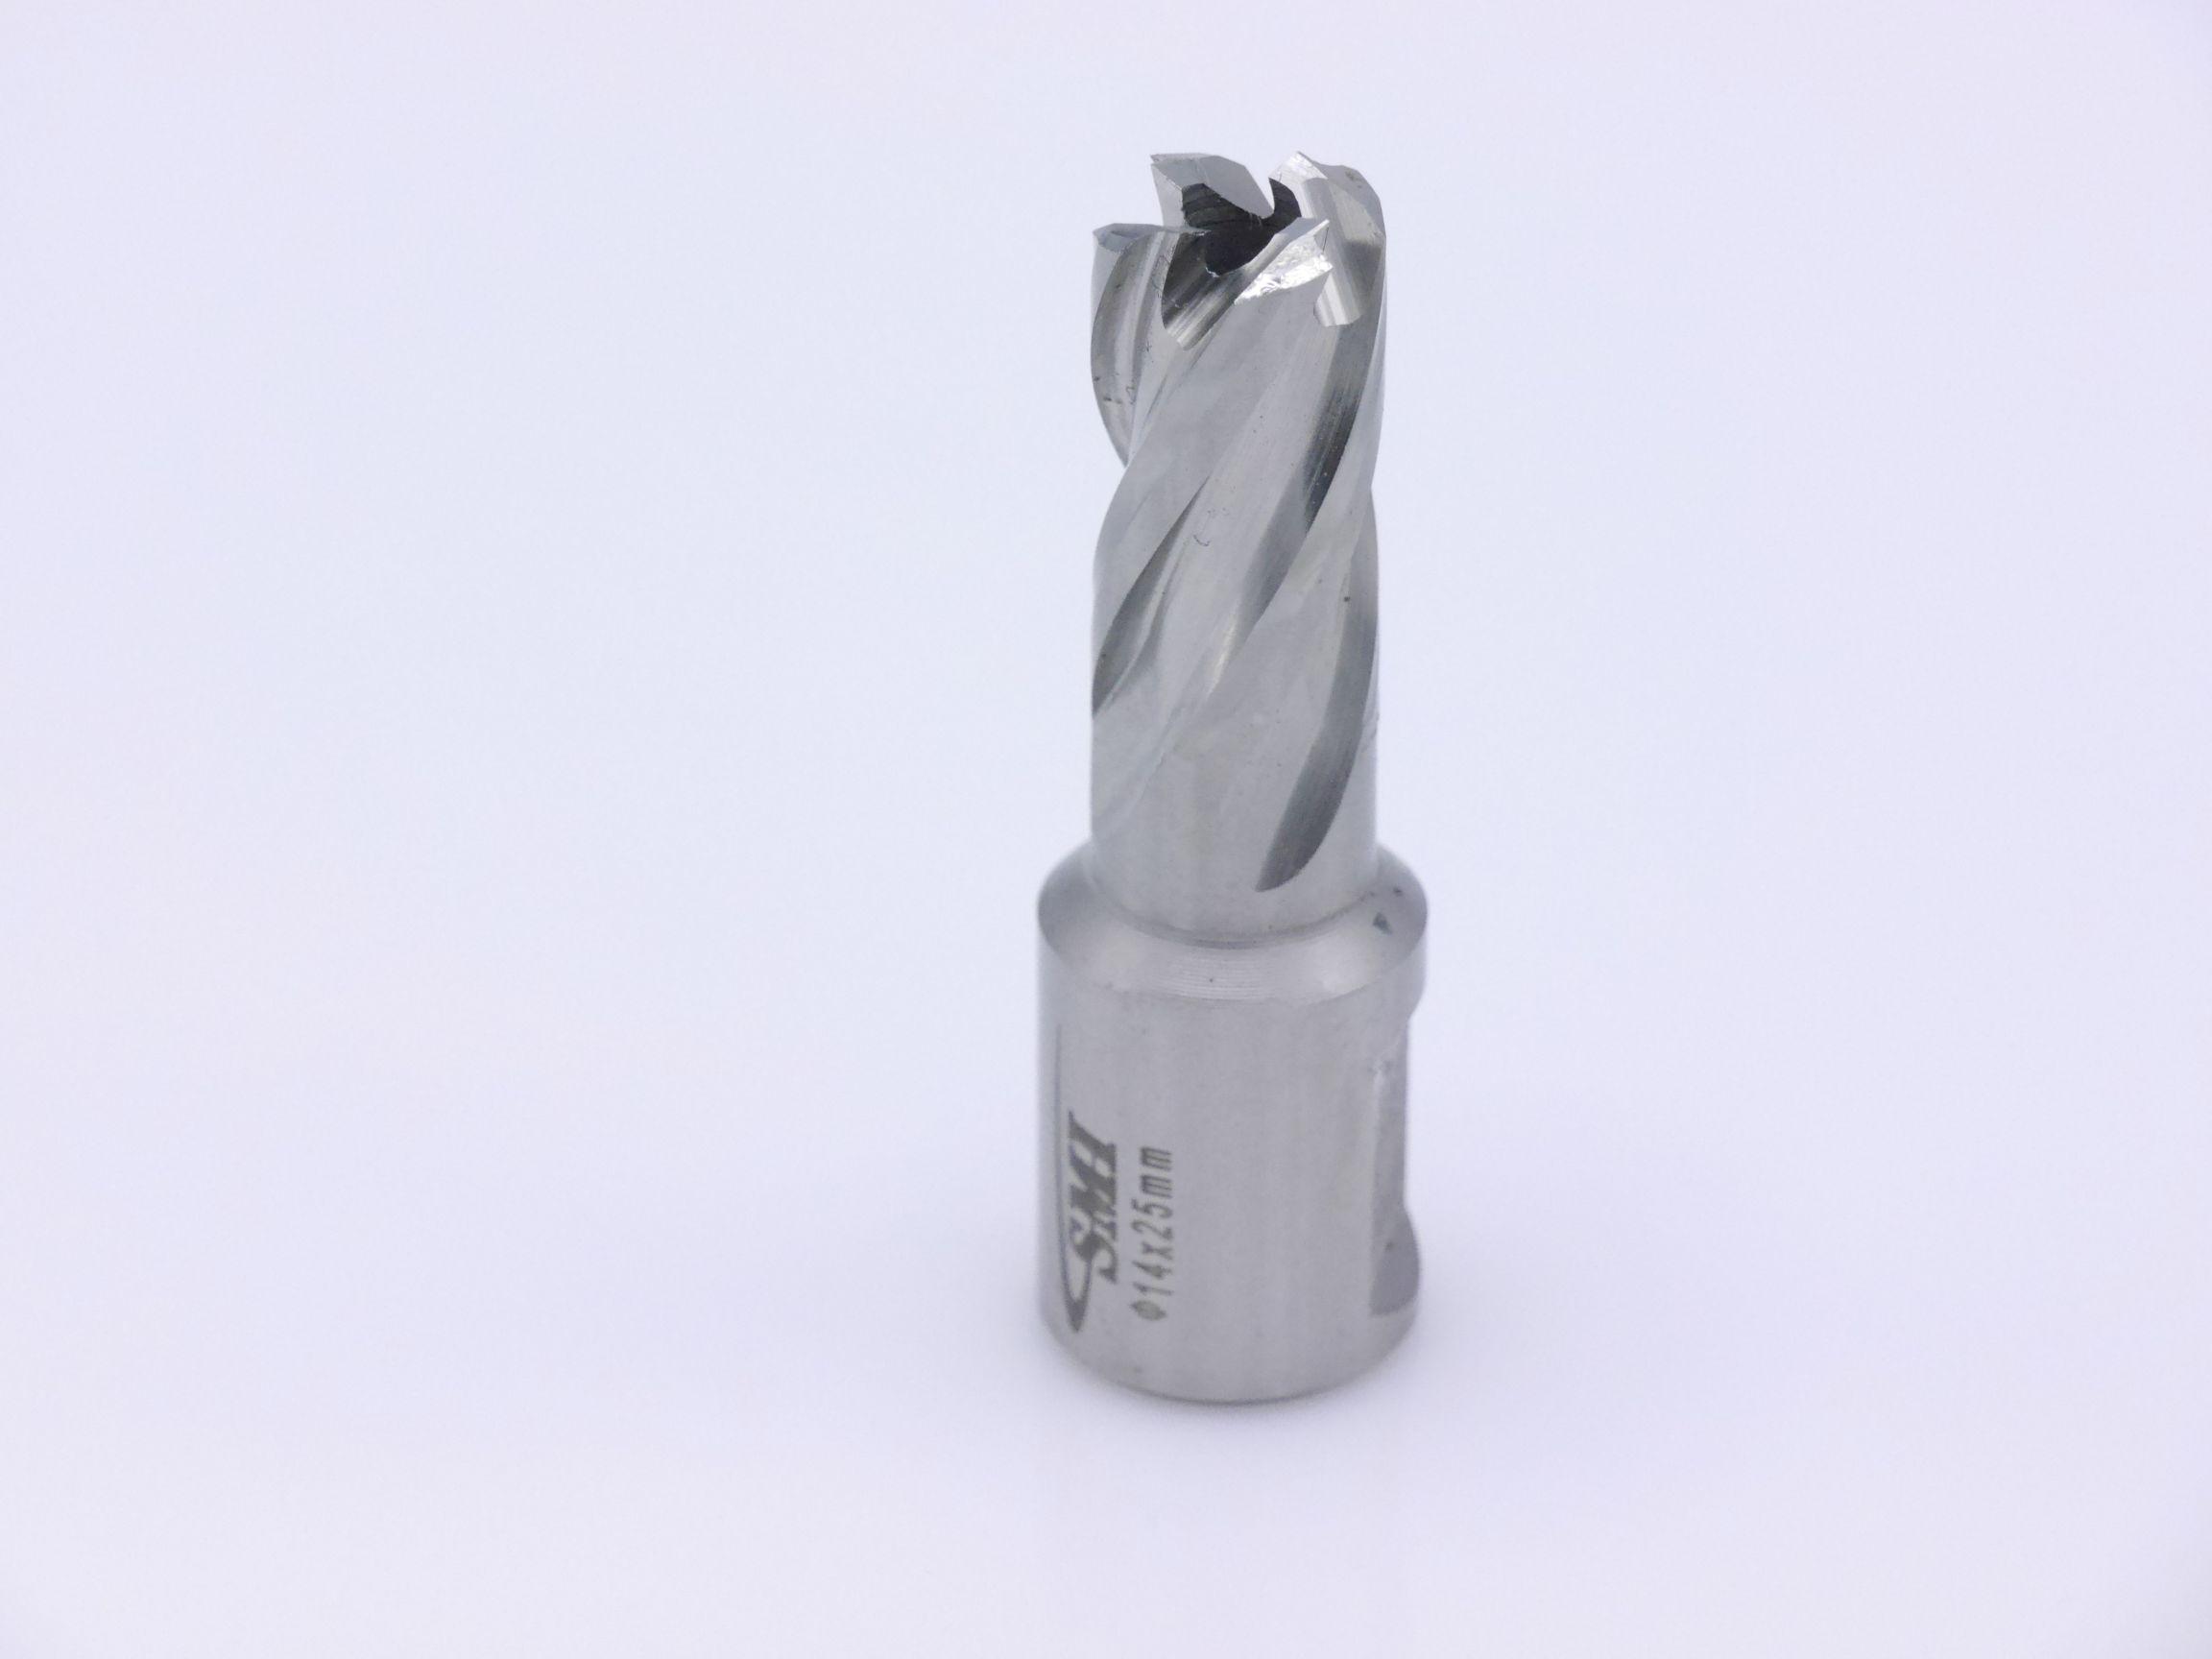 Blindnietmuttern M3 Stahl verzinkt Flachkopf glatt klemmt 0,3-1,8mm 10 Stk